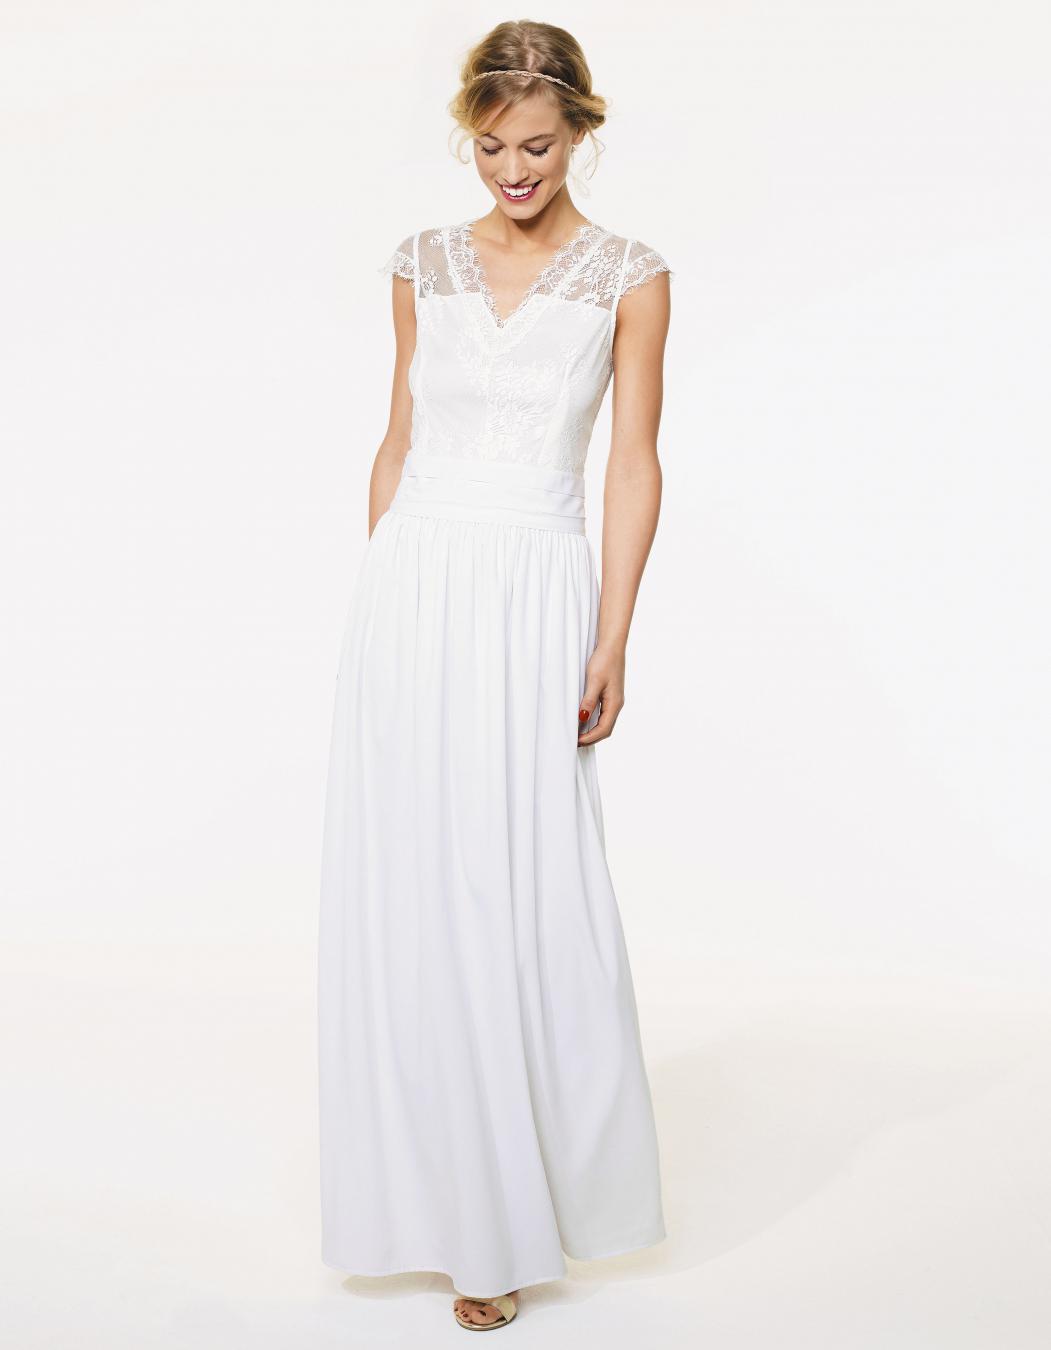 Robe mari e prix le mariage for Katie peut prix de robe de mariage